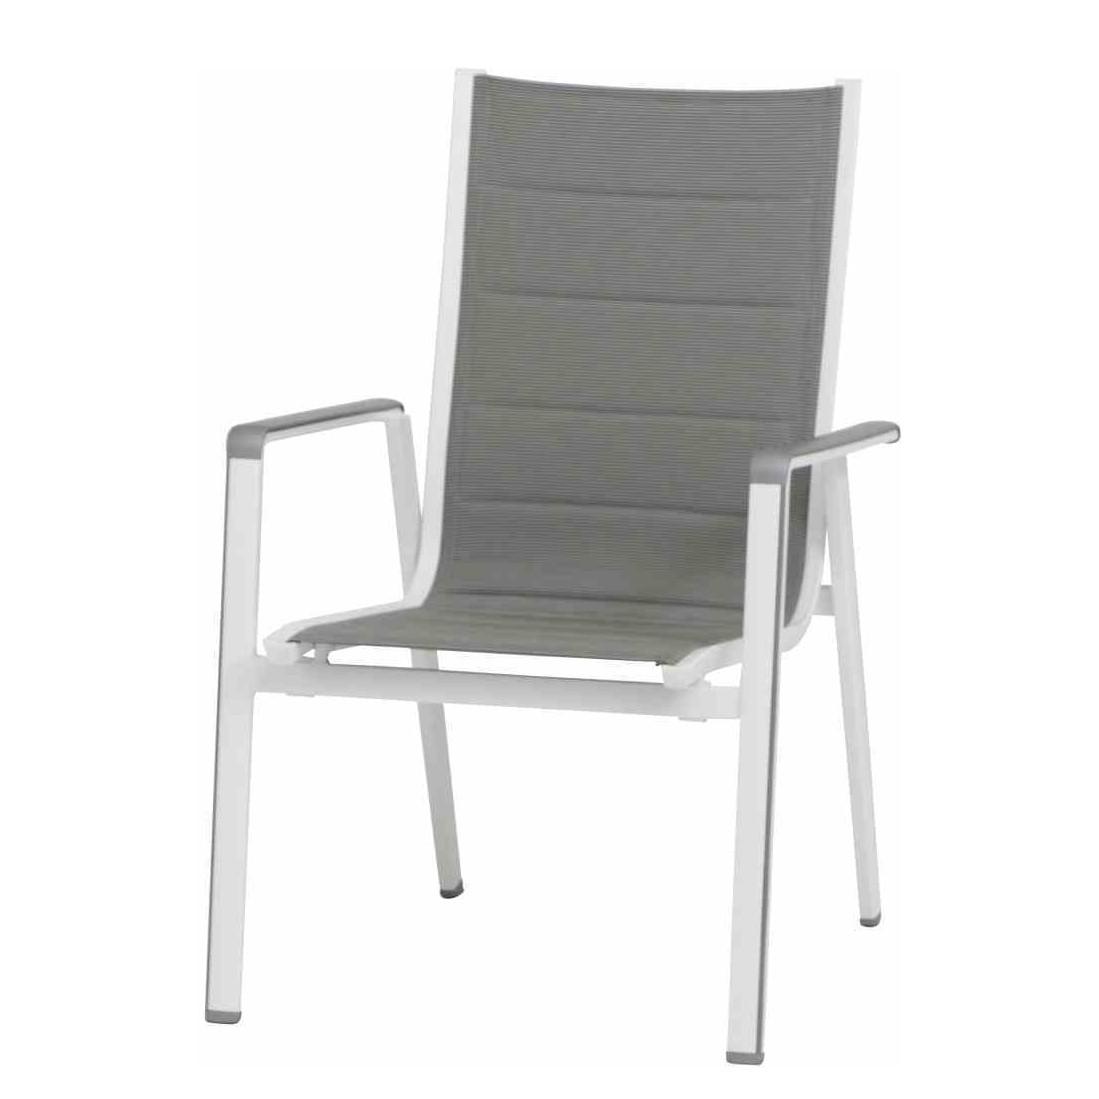 Stapelstuhl Futosa - Kunstfaser / Aluminium - Grau, Mwh